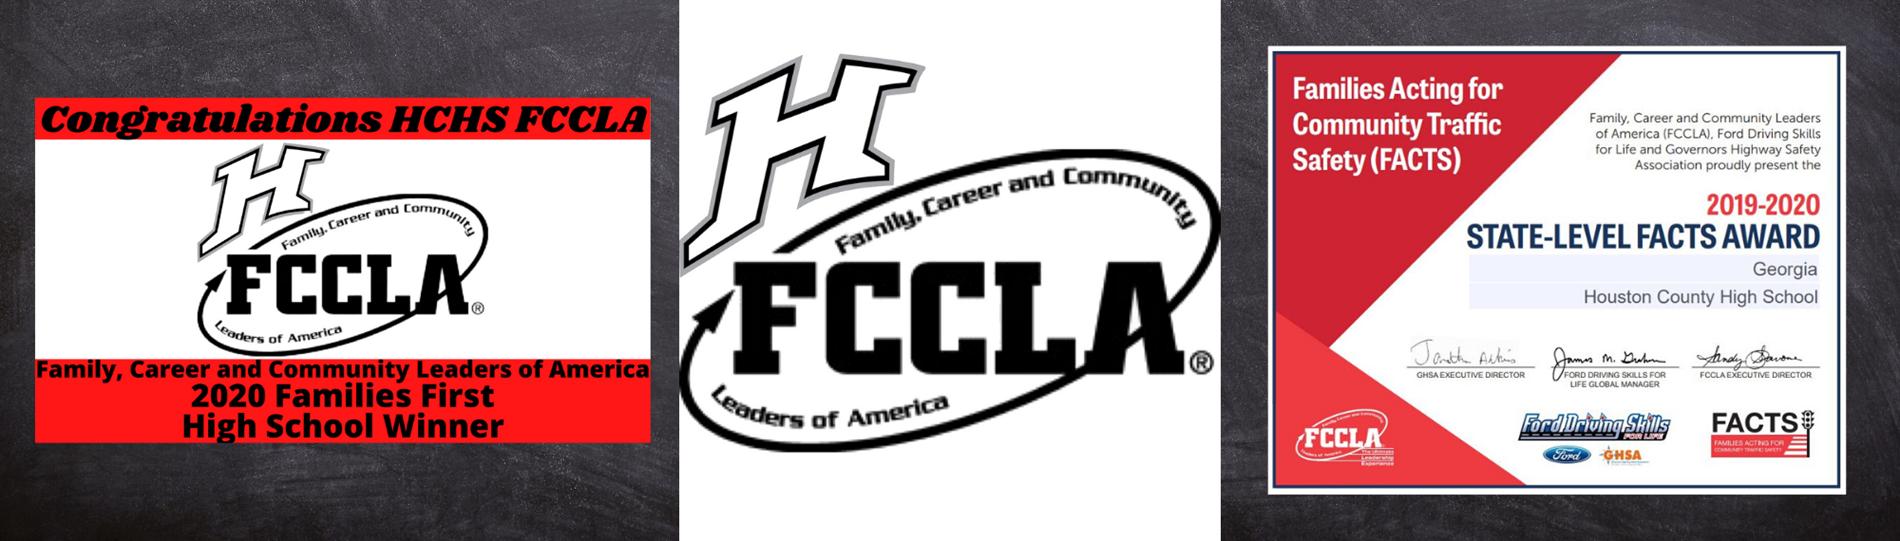 FCCLA Awards